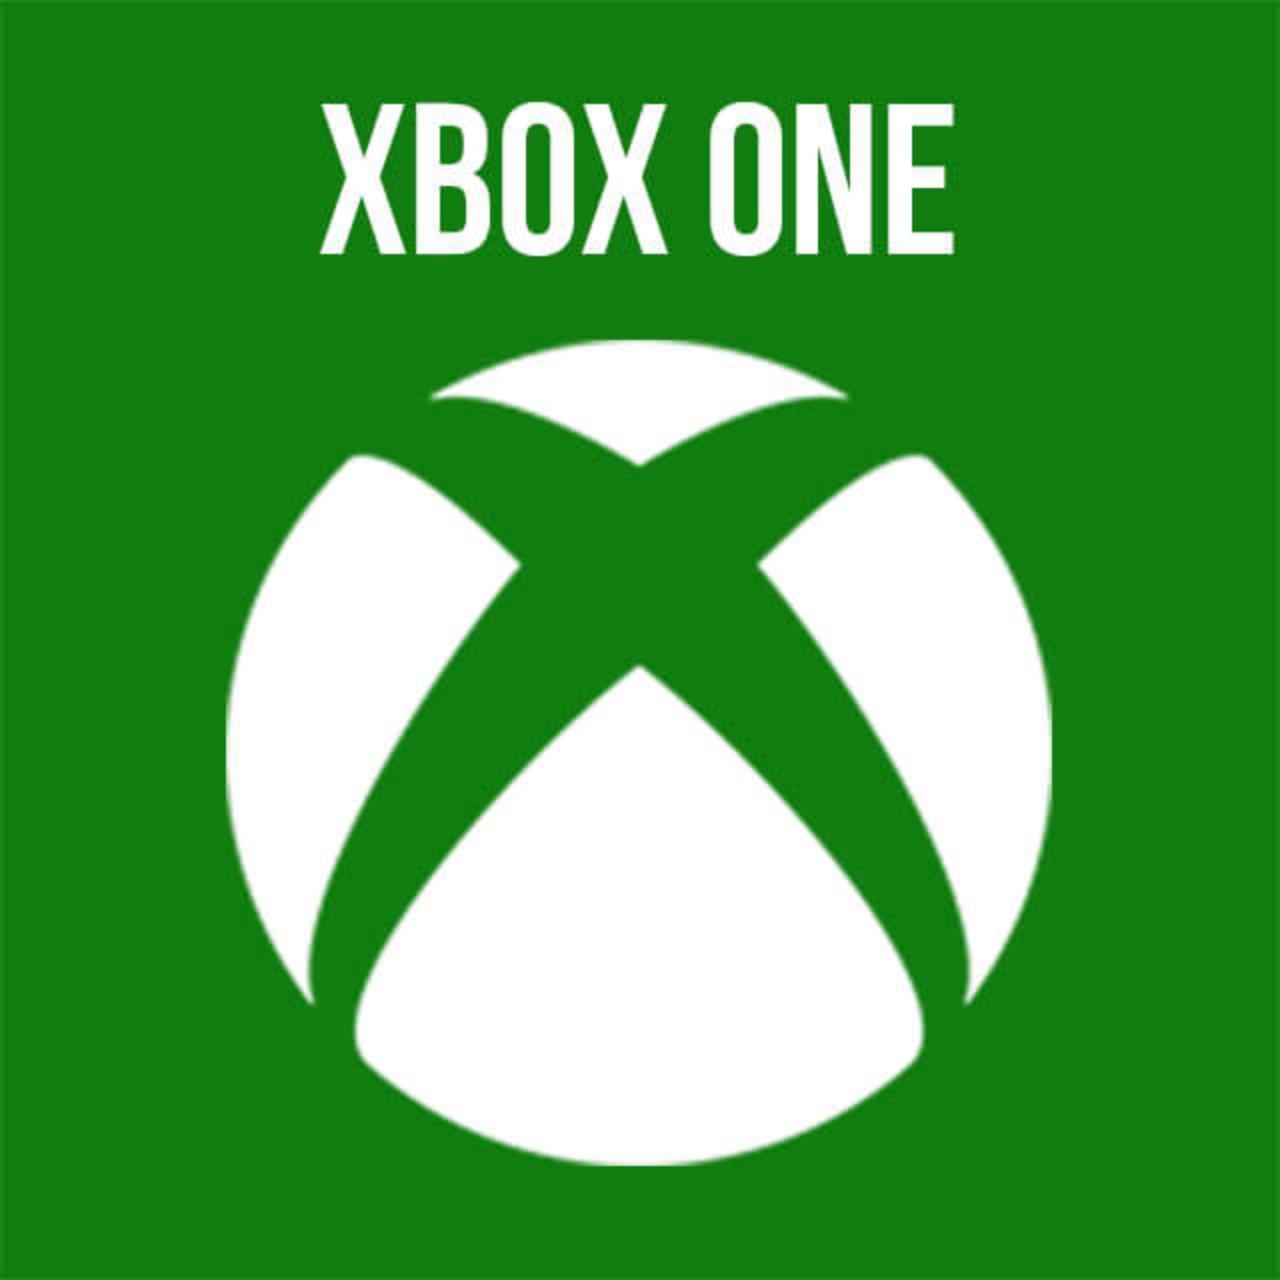 Forza Horizon 4 Credits 25 Million - XBox One Games - Gameflip